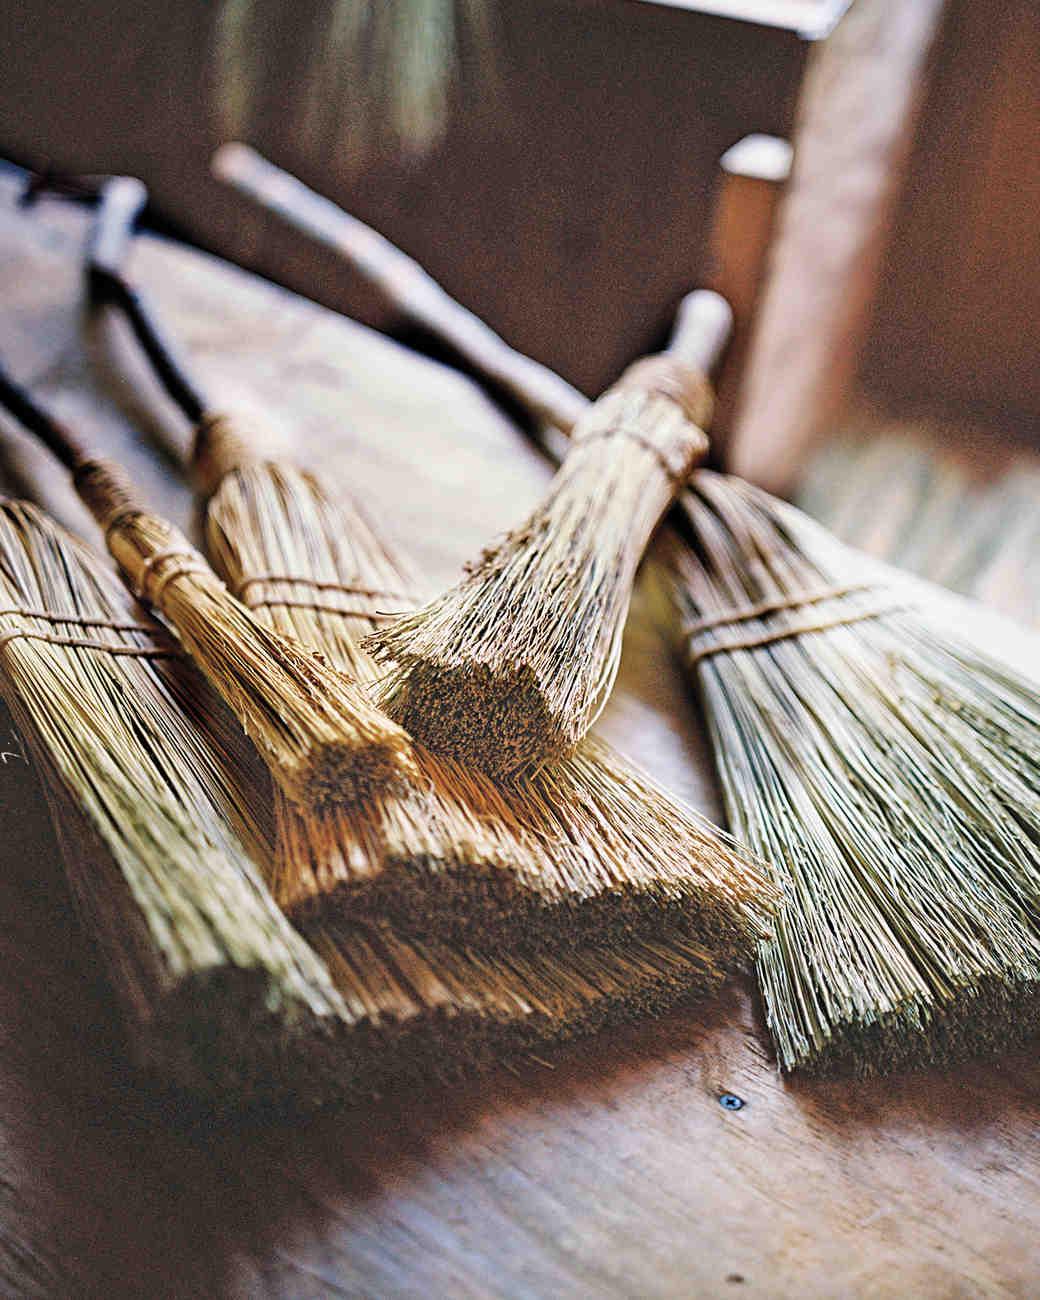 broom-making-1011mld107711f.jpg